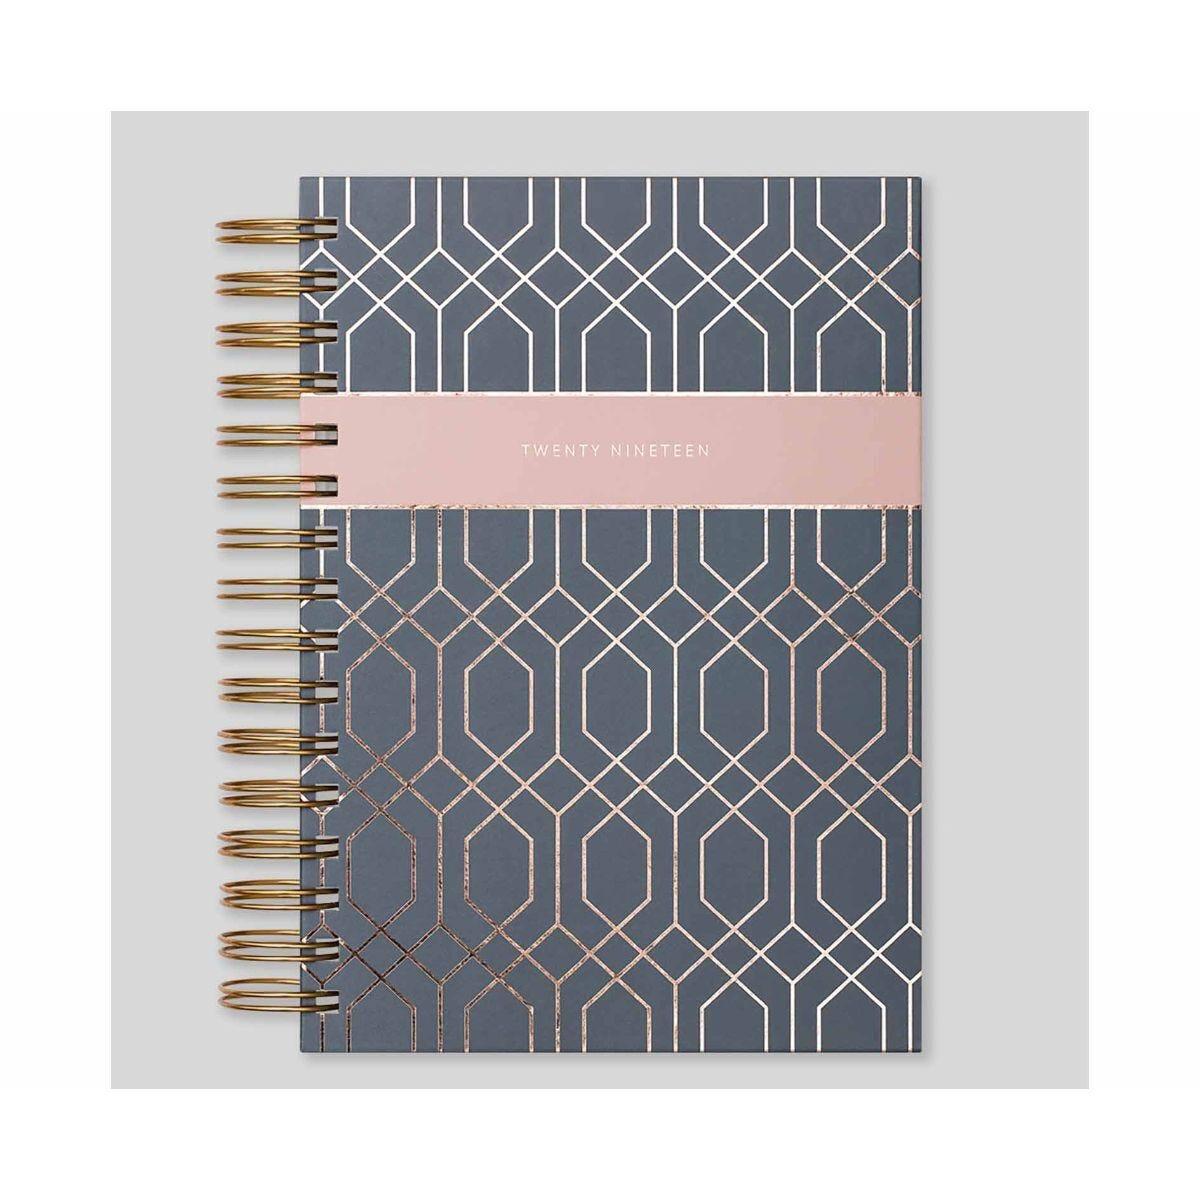 Matilda Myres Geometric Wiro Diary Page a Day A5 2019 Grey